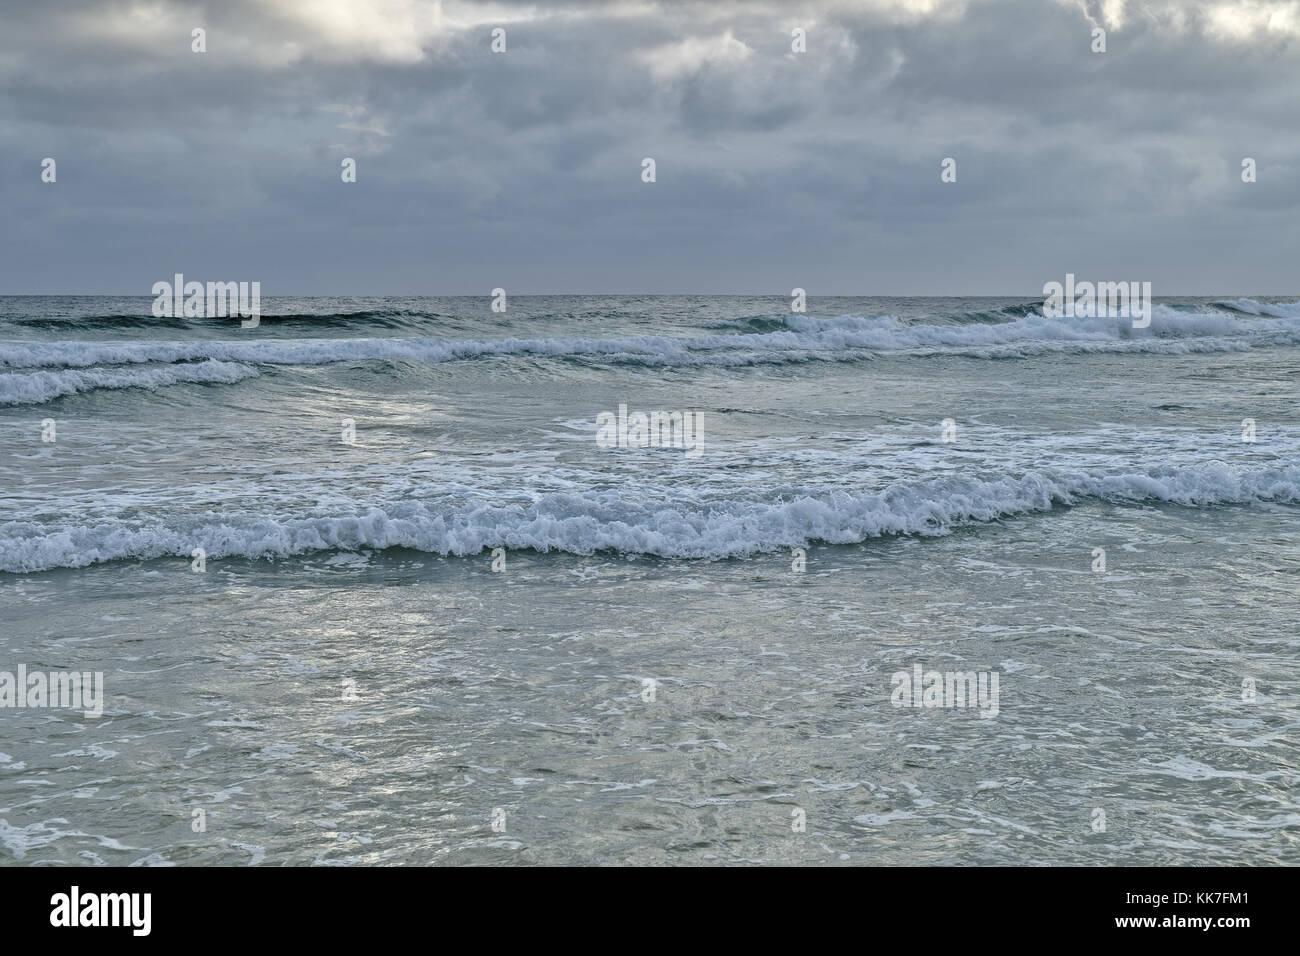 Cloudy scene in Ilha Deserta (Desert Island). Faro, Algarve, Portugal - Stock Image